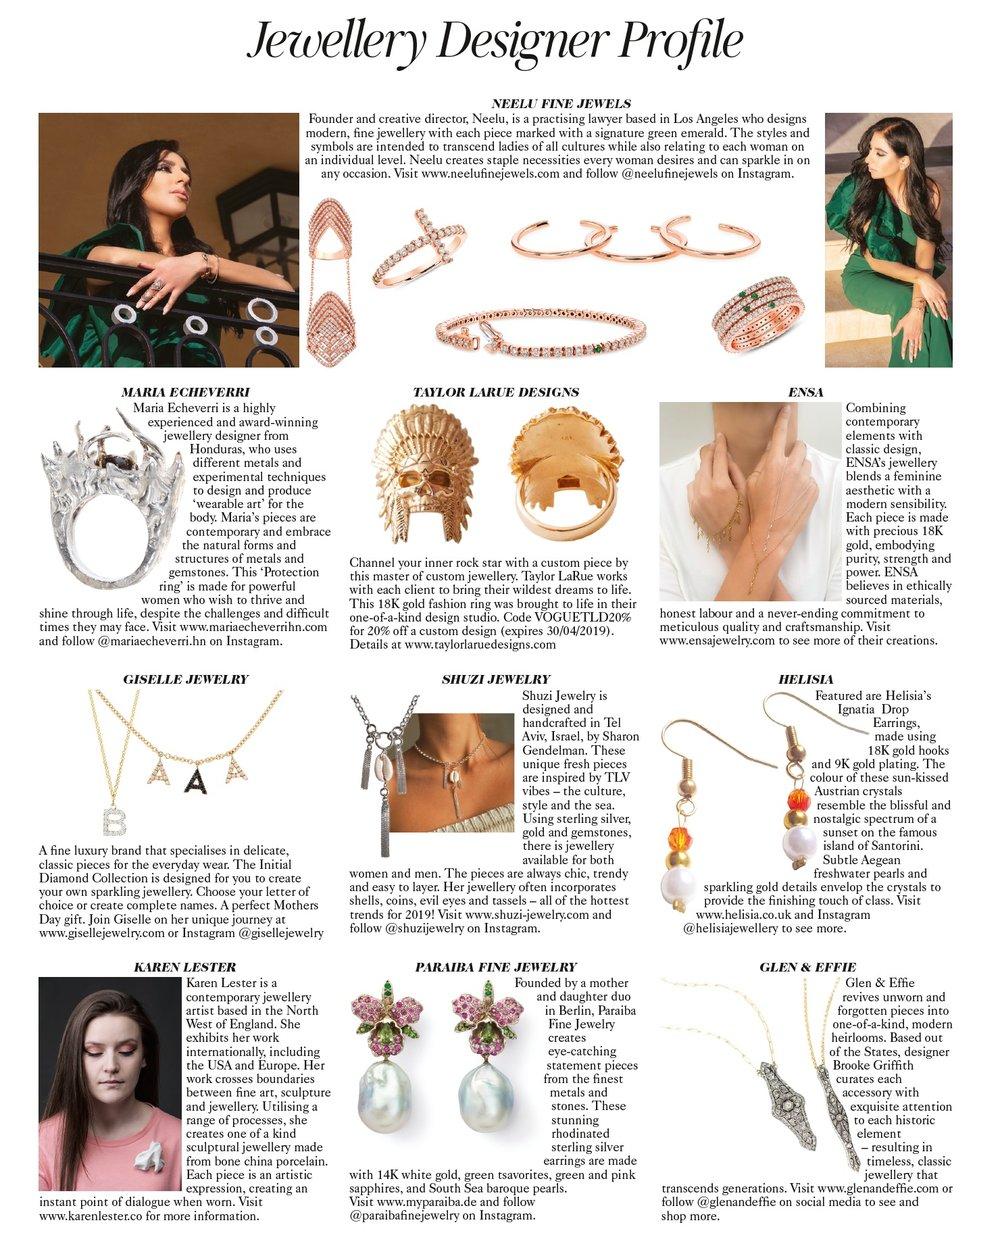 324+-+Jewellery+Designer+Profile.+glenandeffie.vogue.jpg